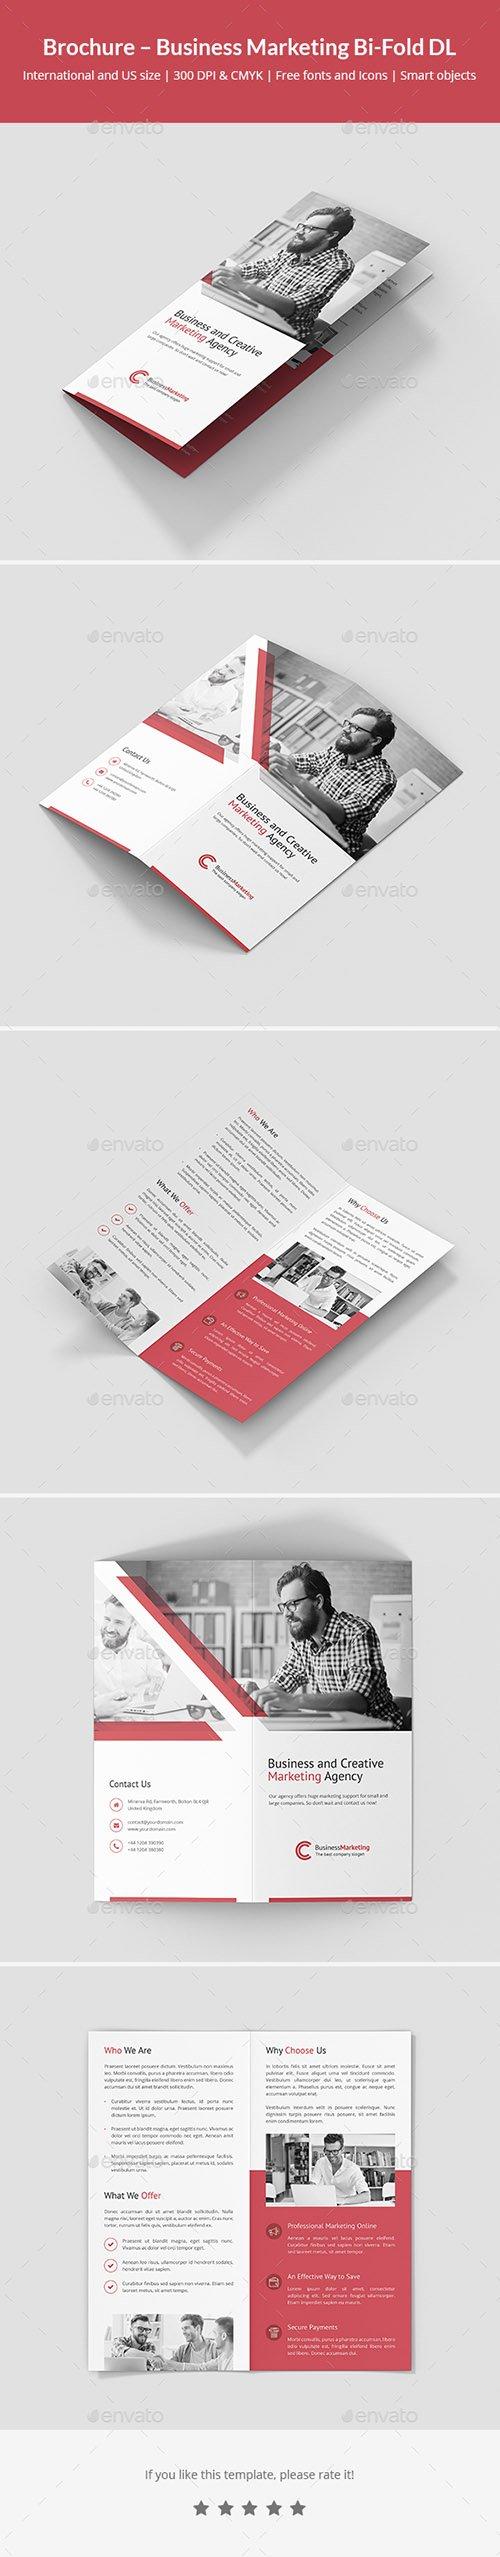 Brochure – Business Marketing Bi-Fold DL 21399882